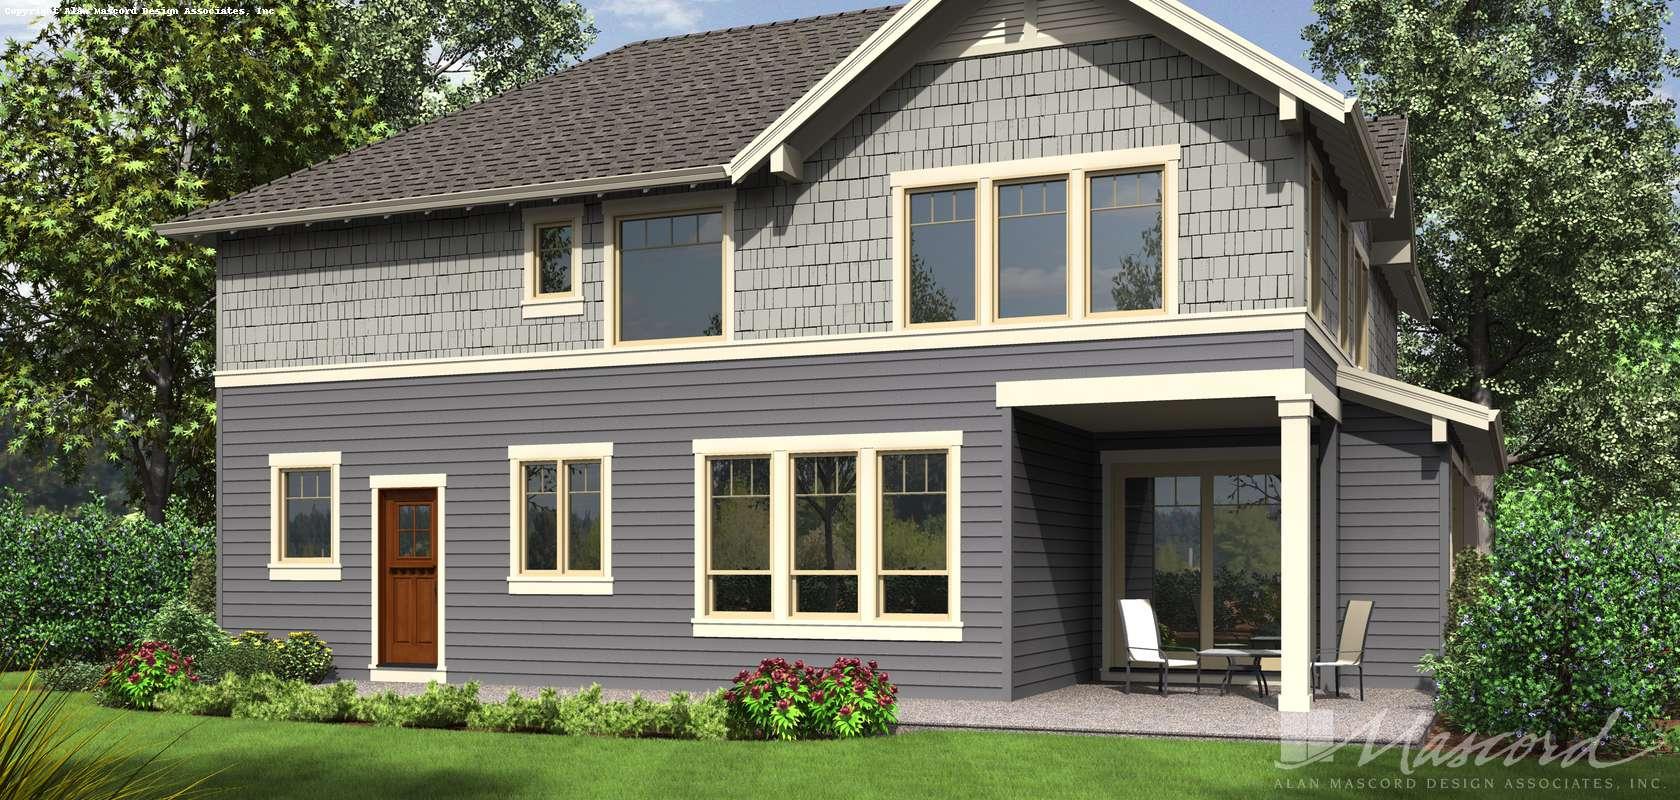 Mascord House Plan 22199: The Hood River